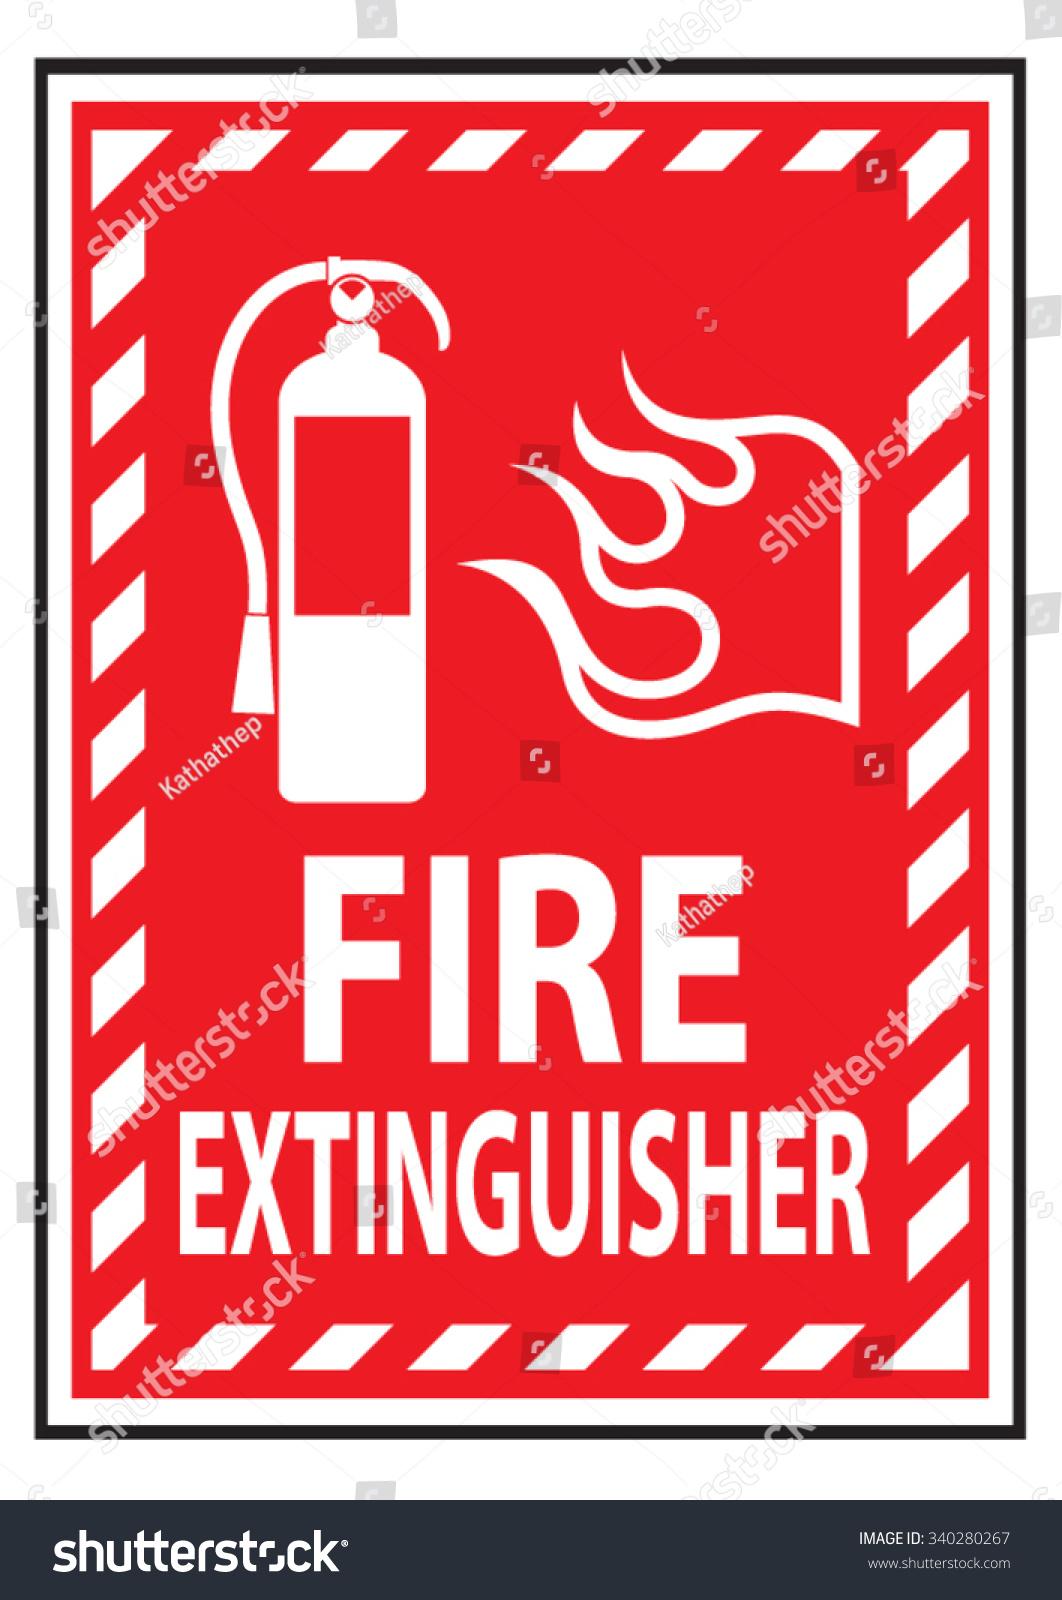 fire extinguisher sign stock vector 340280267 shutterstock